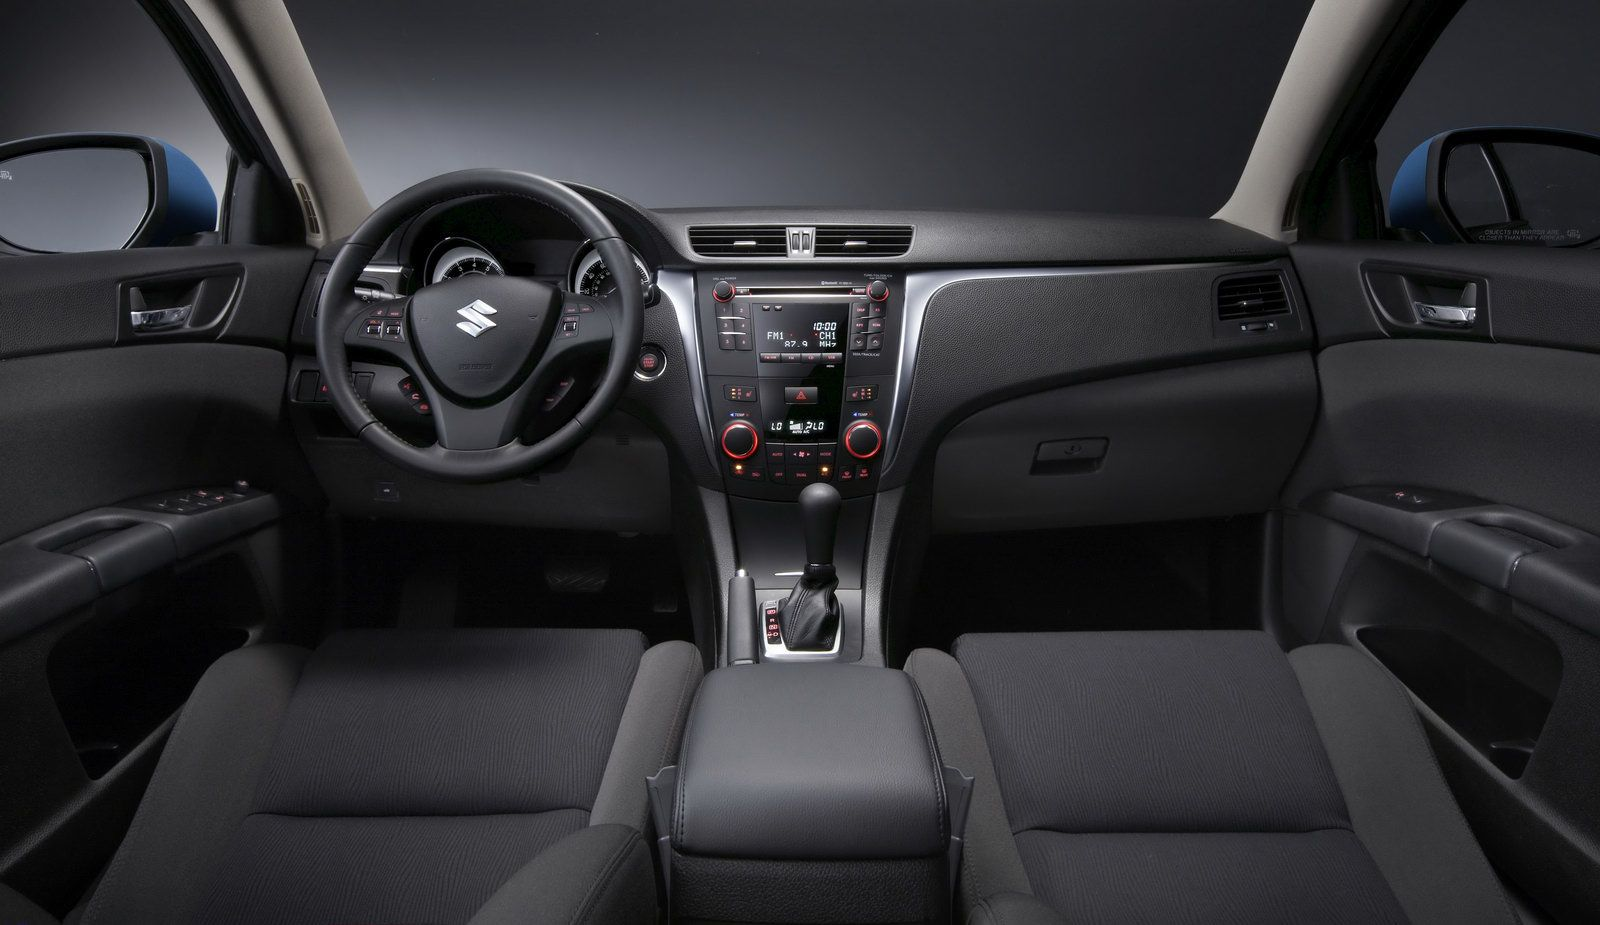 2015 Suzuki Swift Interior Fantastic Car Things I Love